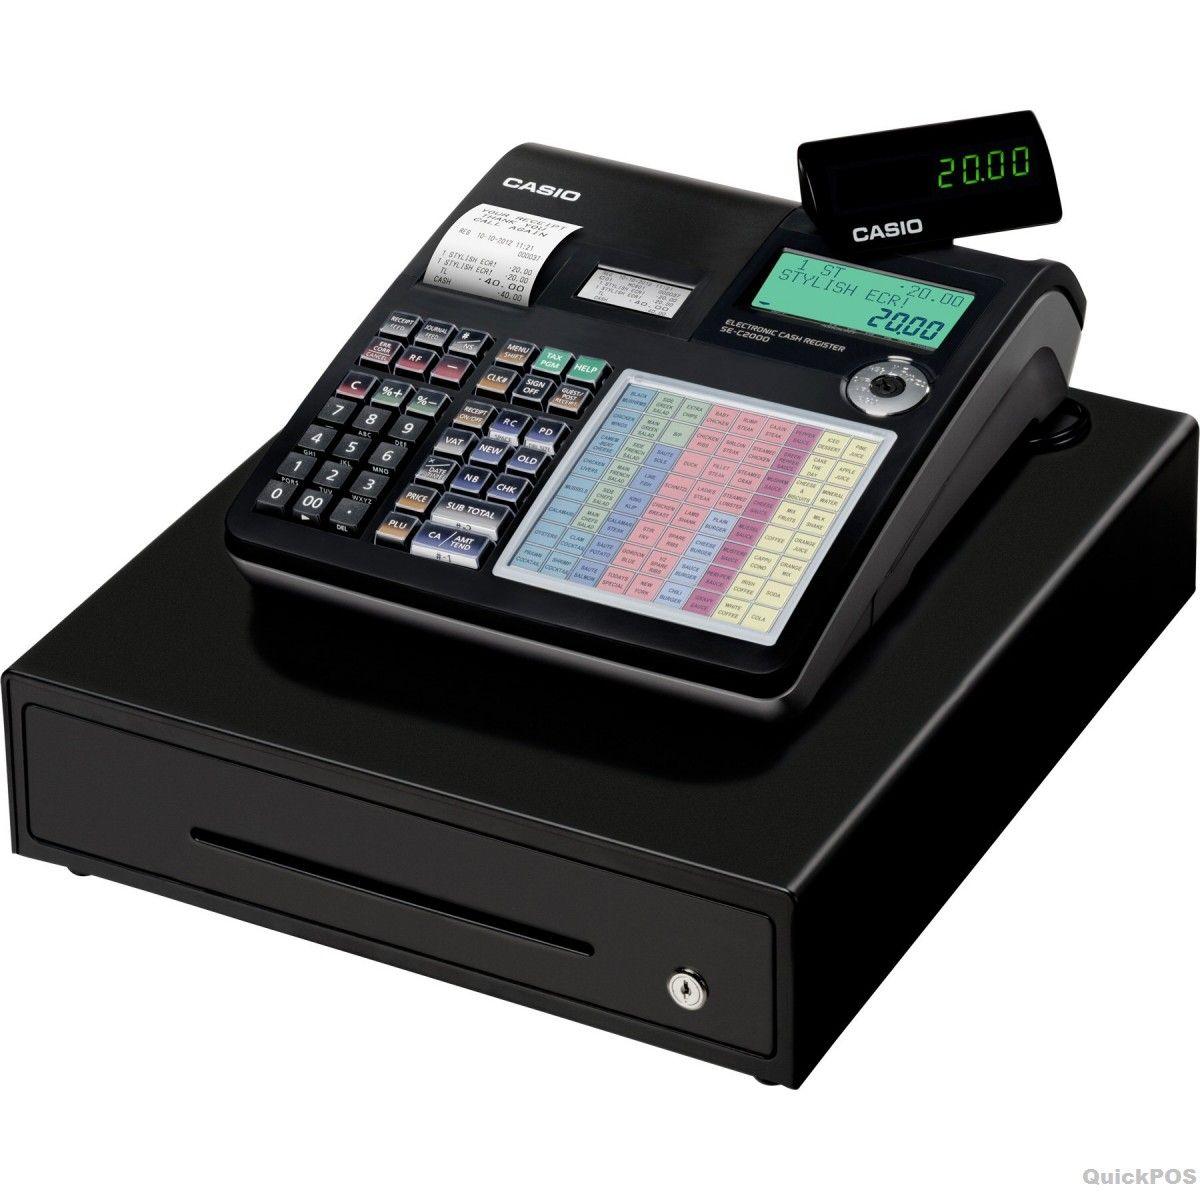 Casio sec2000 cash register compact and stylish design